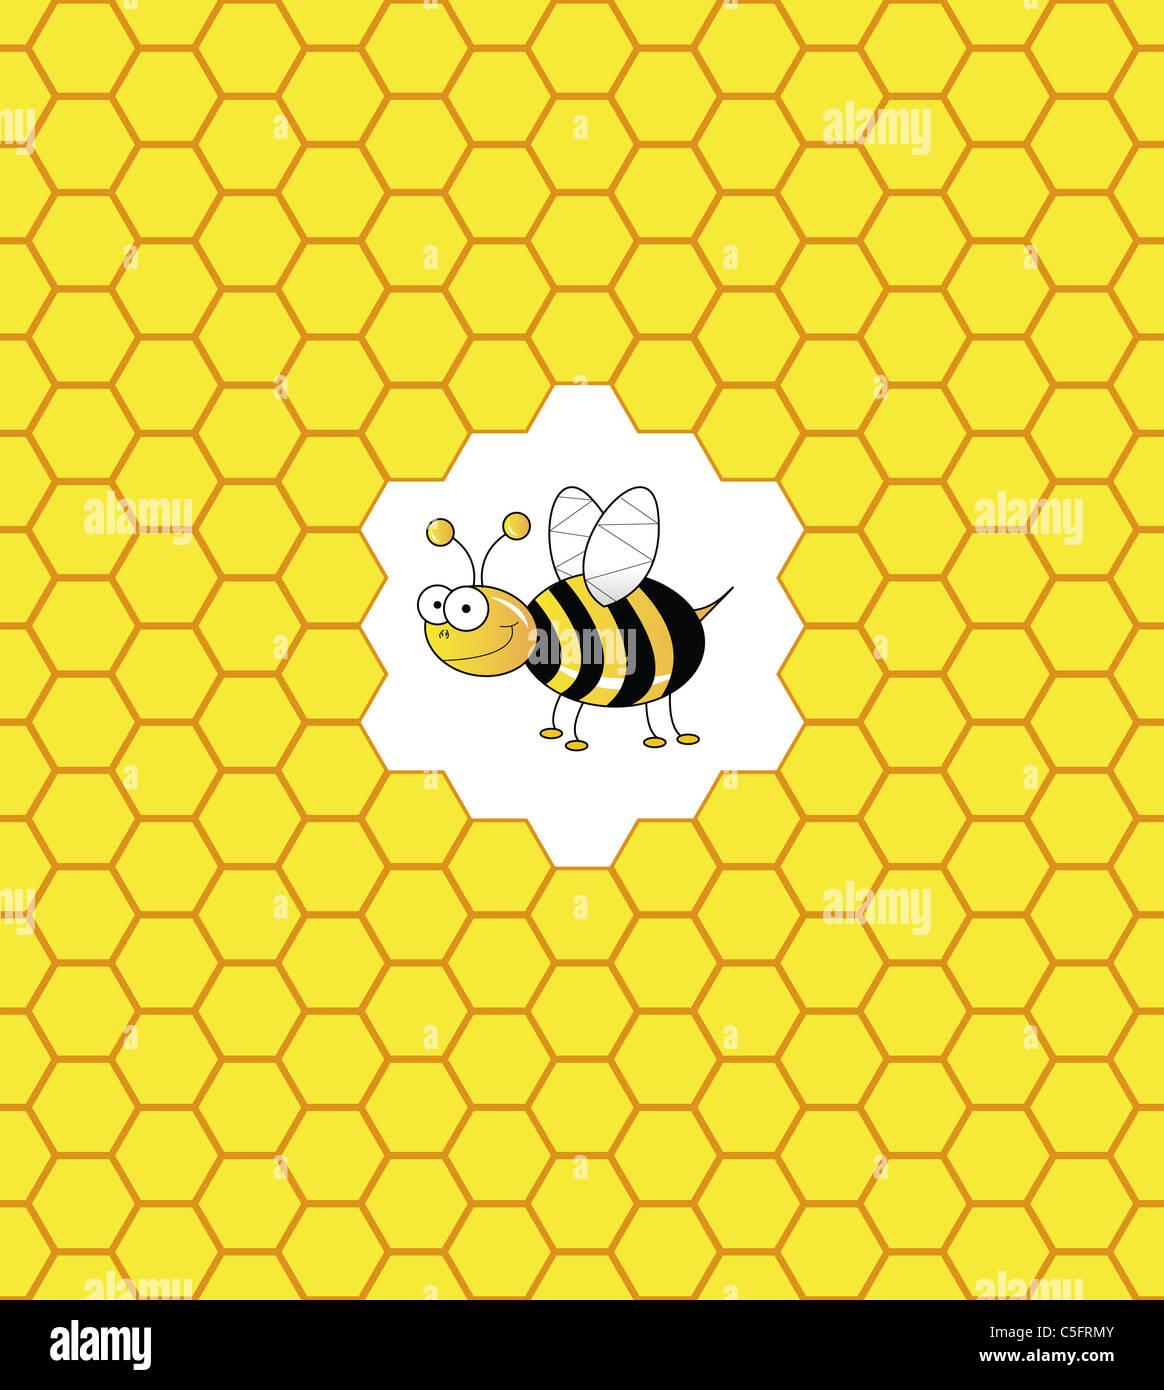 Ziemlich Bumble Bee Bienenstock Färbung Seite Ideen ...